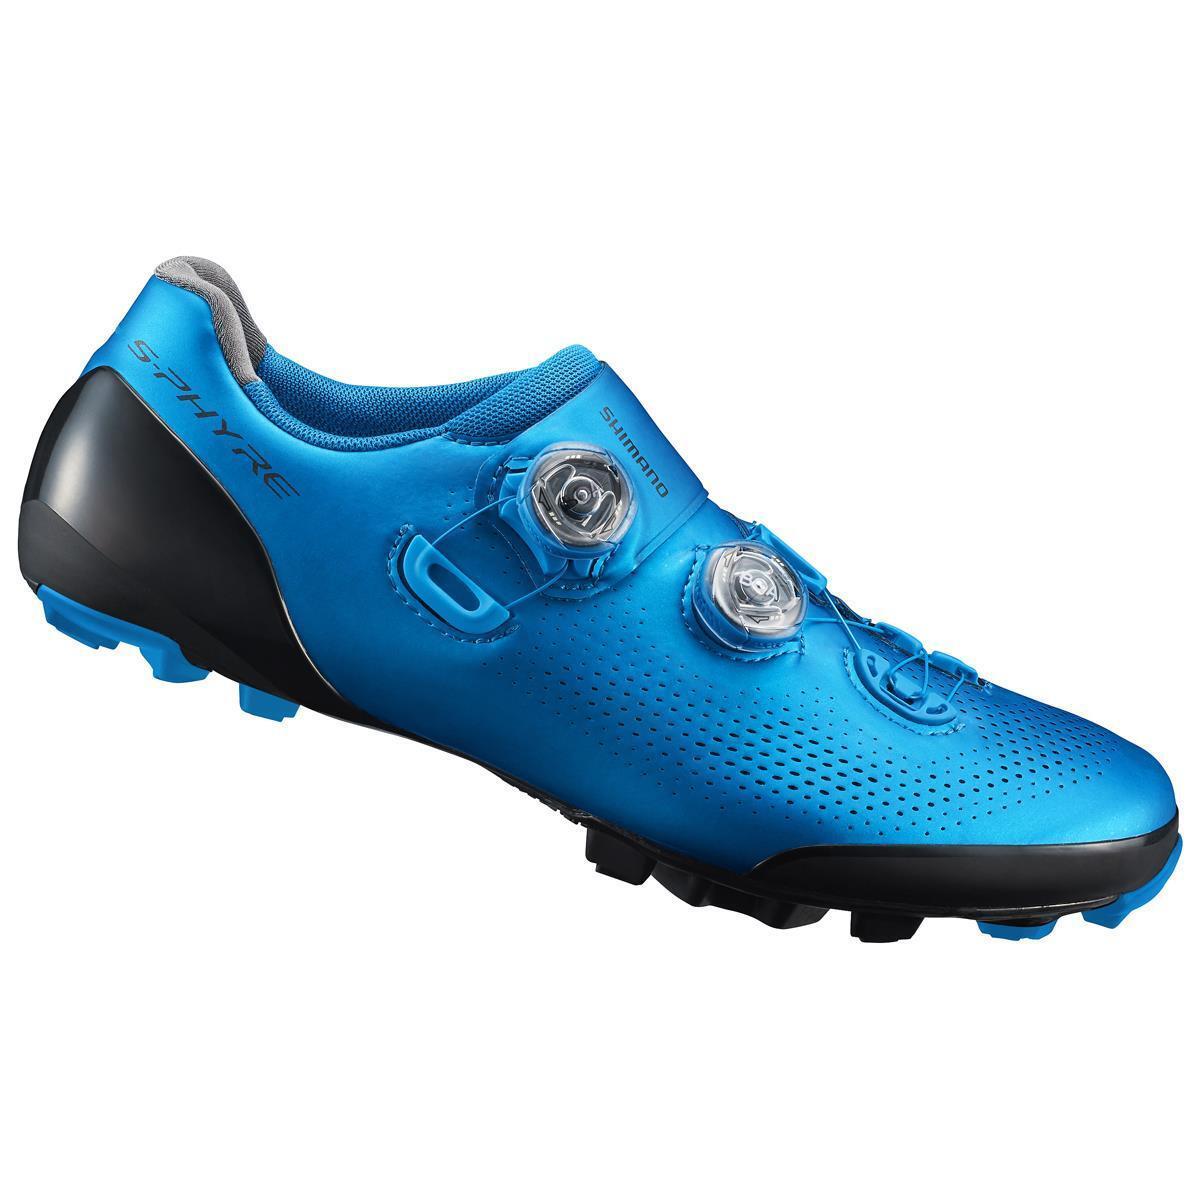 S-PHYRE XC9 SH-XC901SL1 mtb zapatos azul 2019 SHIMANO cycling zapatos